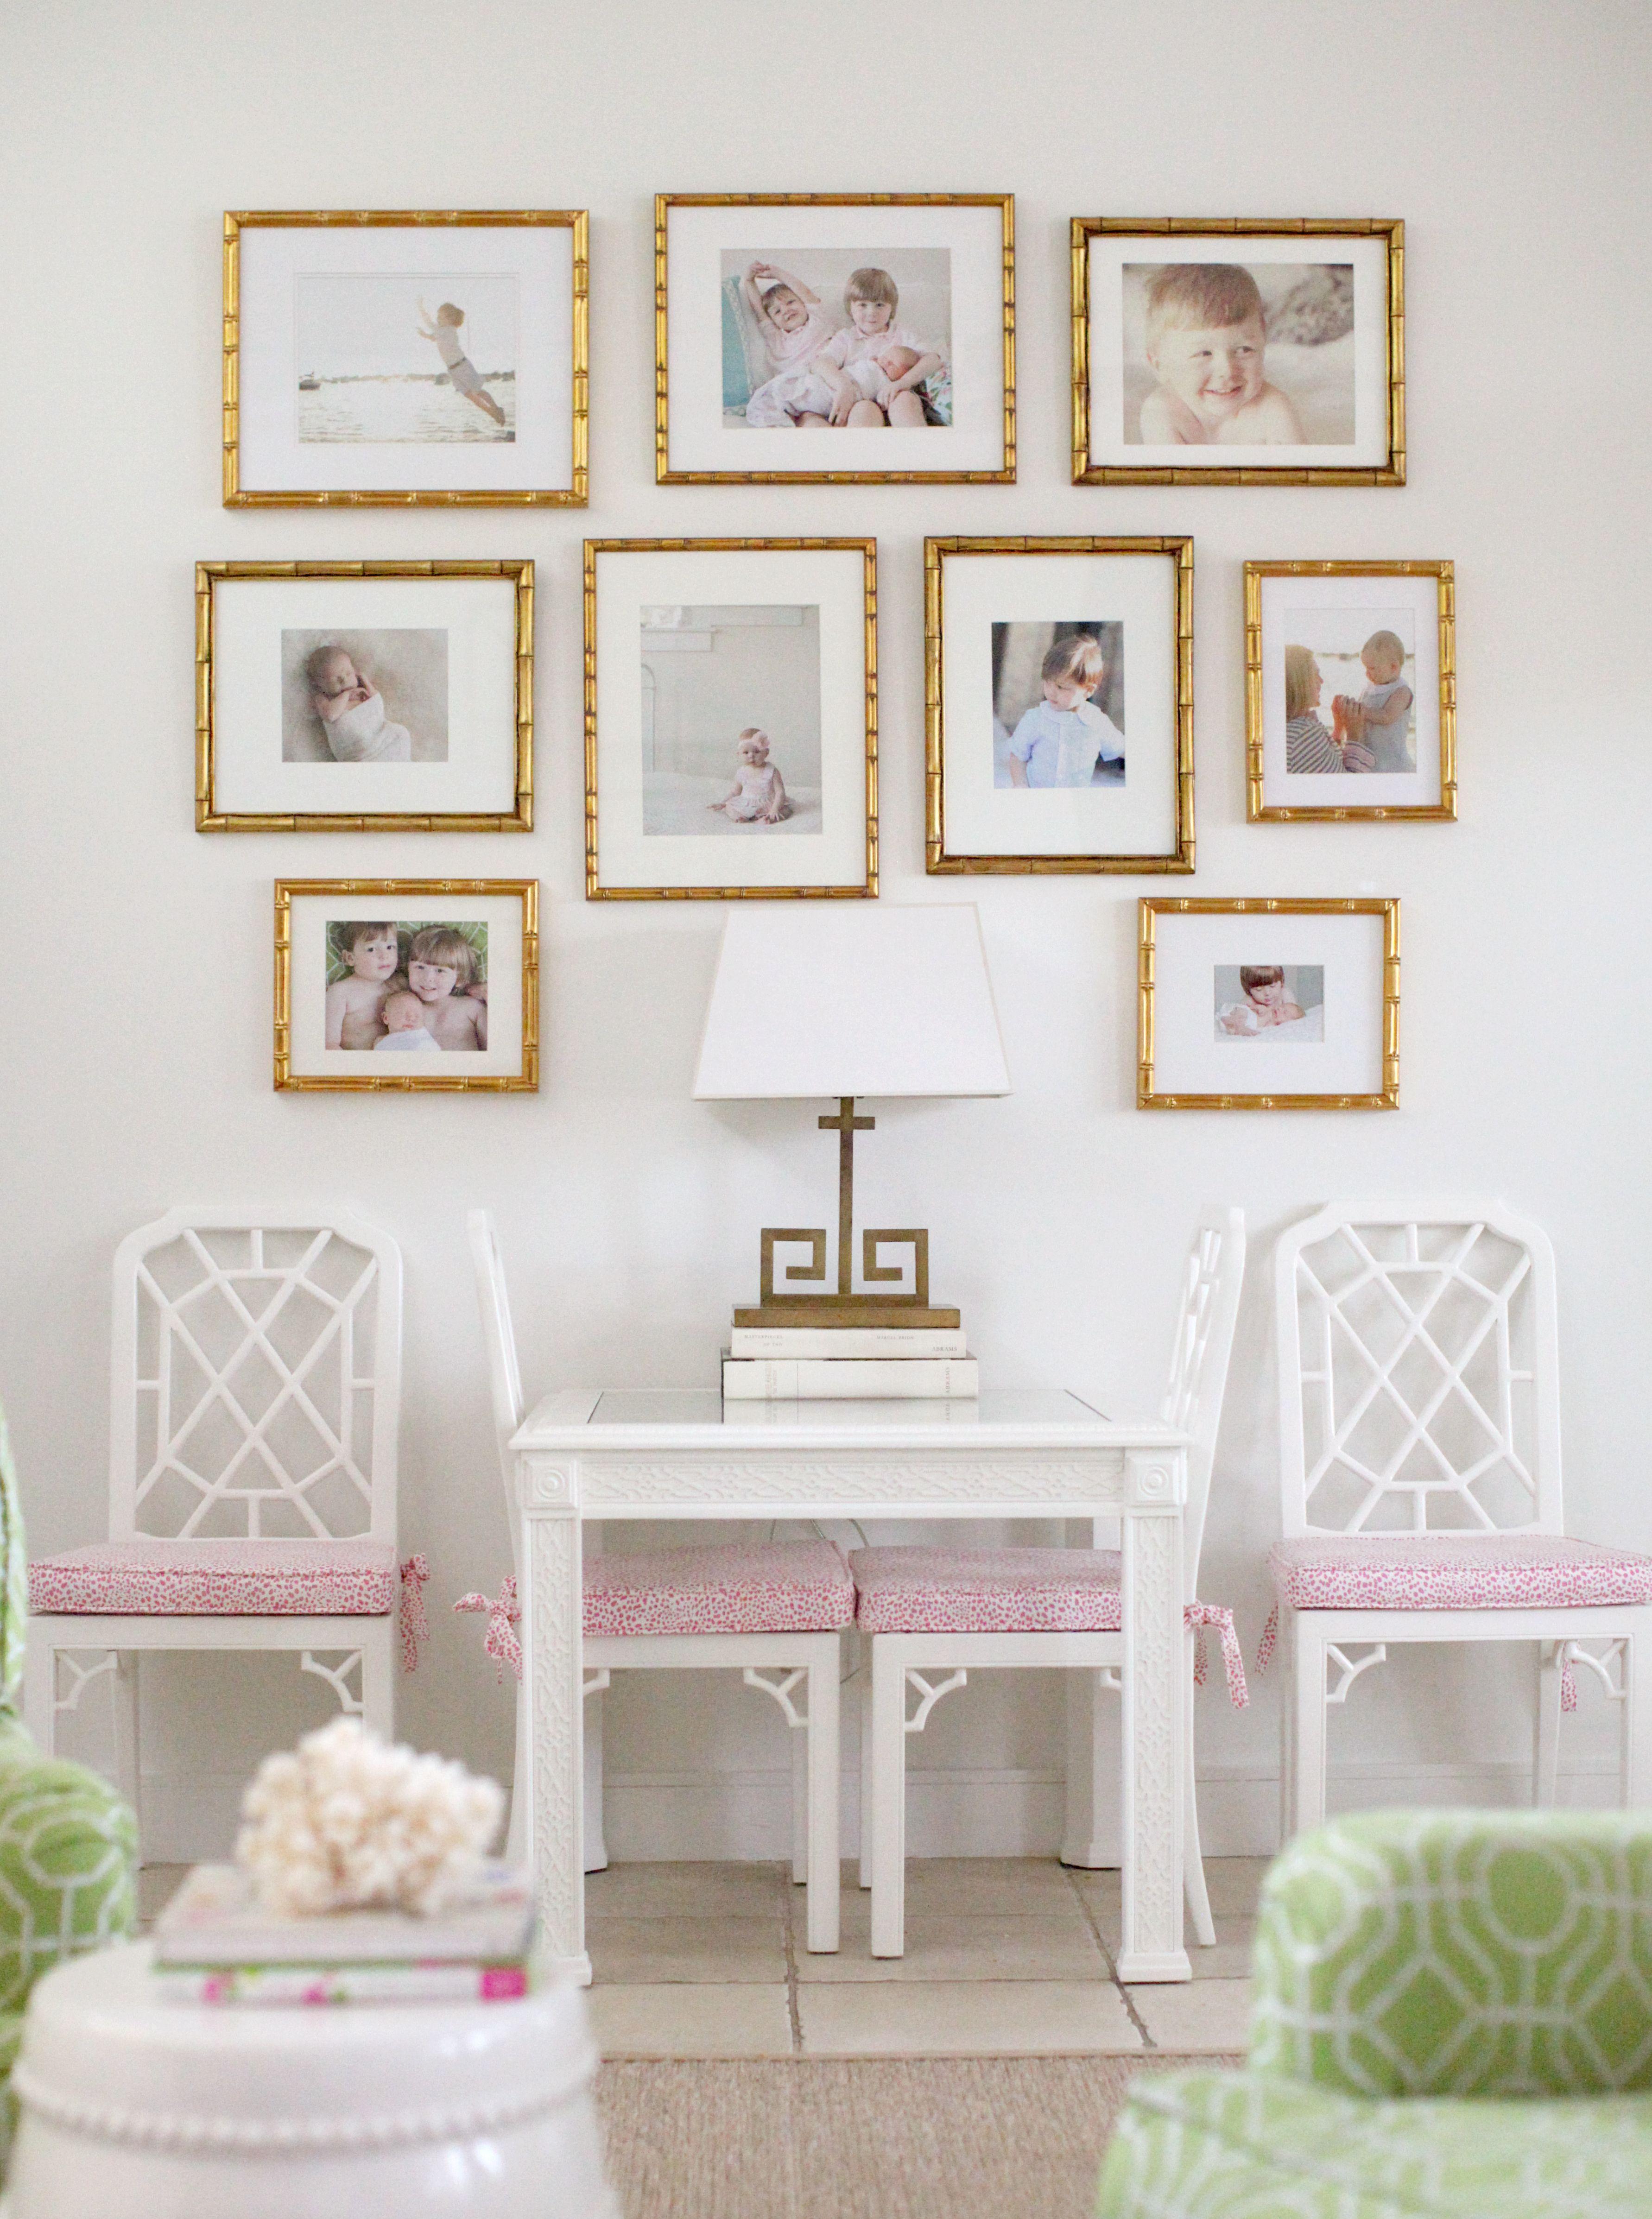 cottage and vine gallery wall inspiration. Black Bedroom Furniture Sets. Home Design Ideas